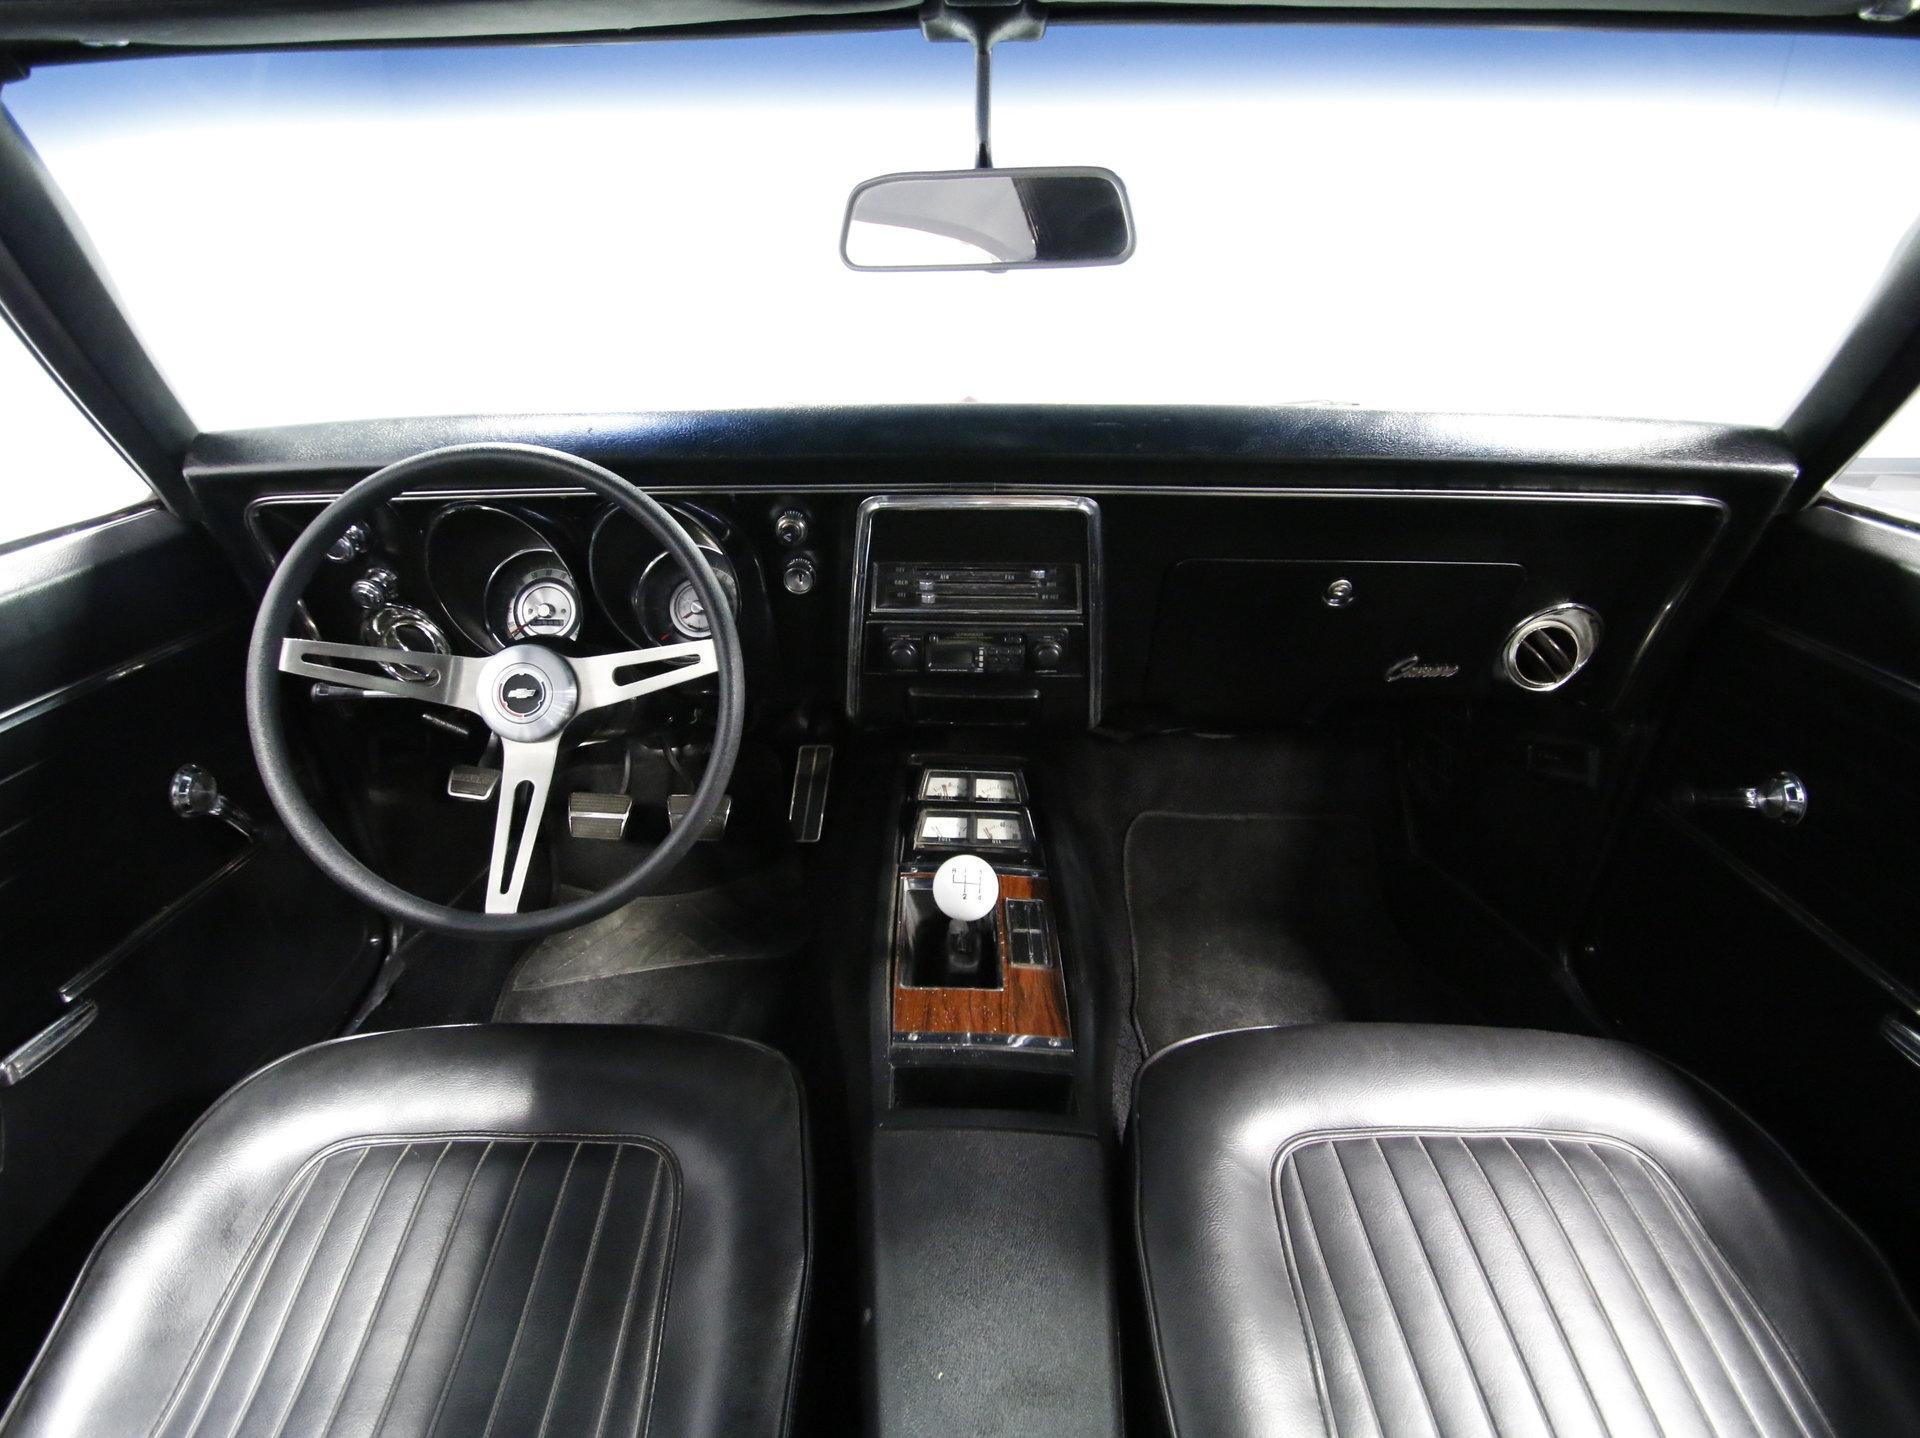 1968 Chevrolet Camaro Streetside Classics The Nations Trusted Symbol Show More Photos